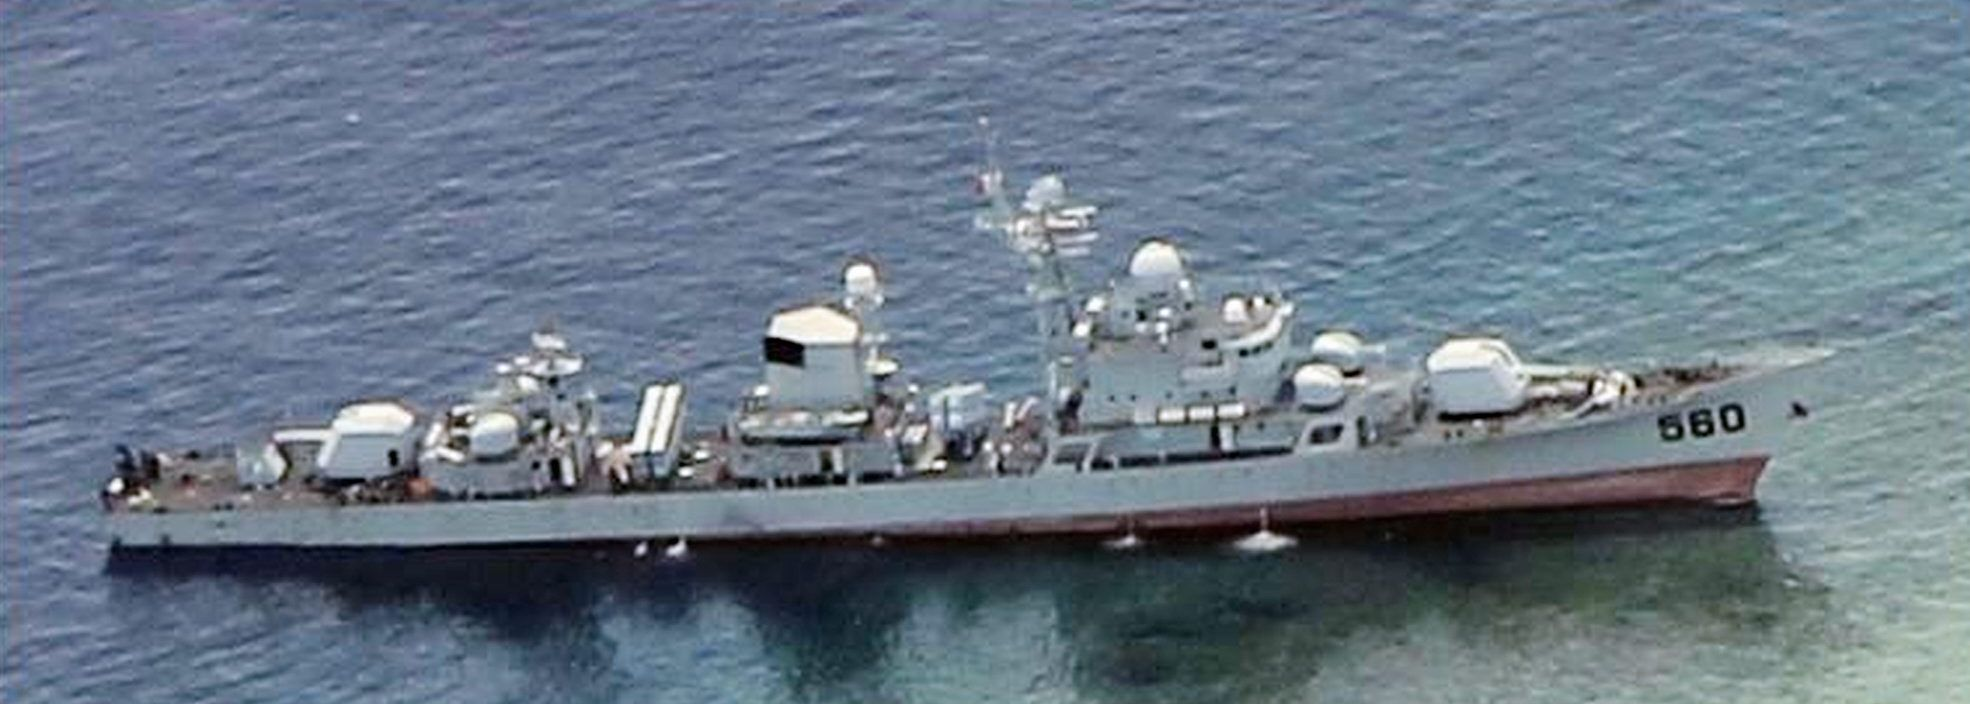 Chinese frigate Dongguan aground on Half Moon Shoal.jpg